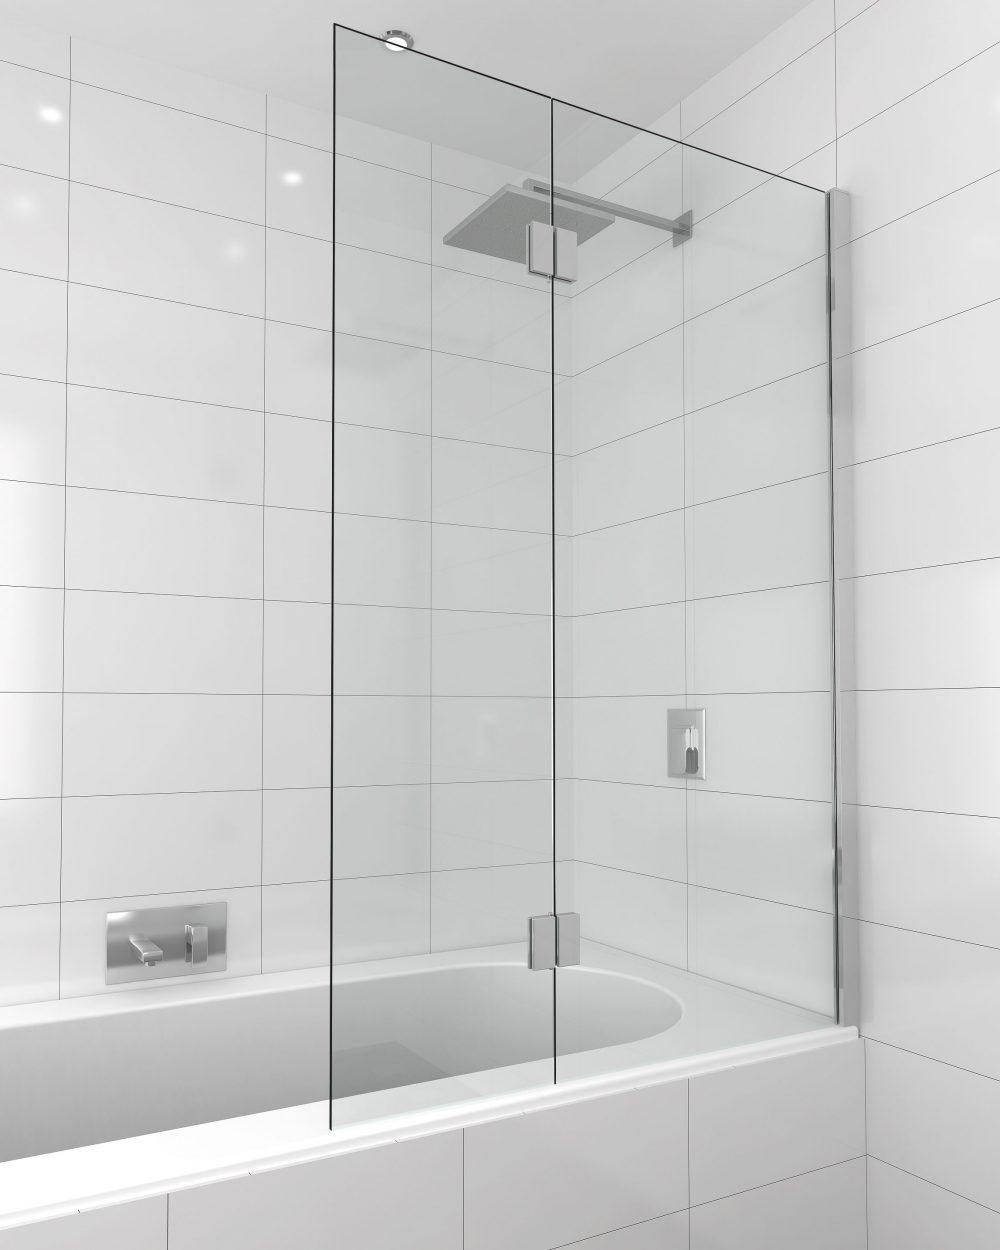 frameless glass bath panel with hinge